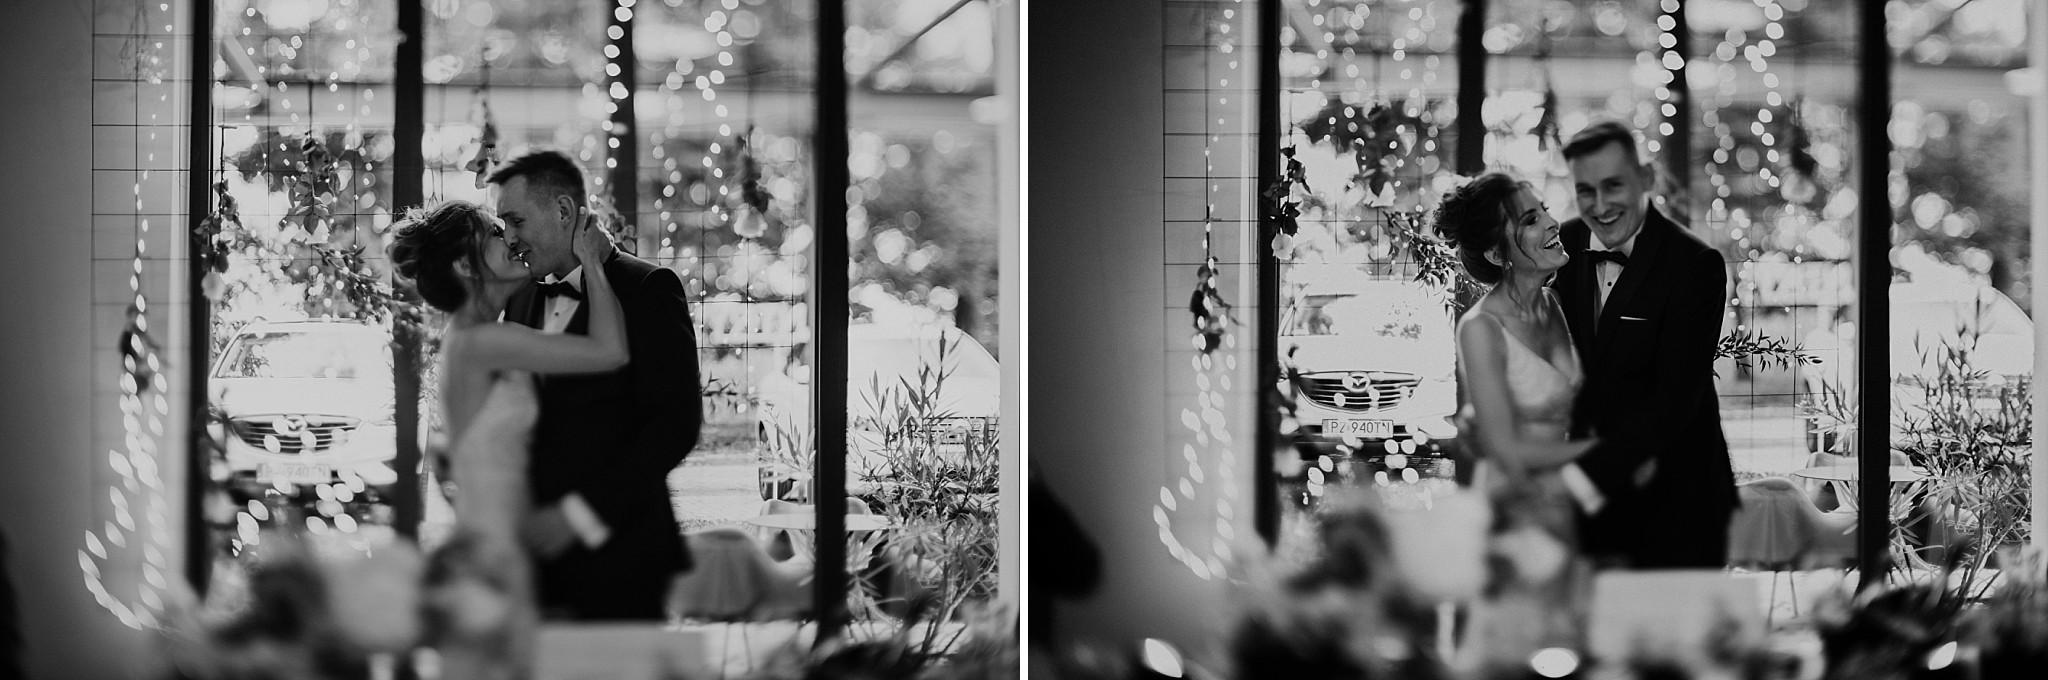 fotograf poznan wesele dobra truskawka piekne wesele pod poznaniem wesele w dobrej truskawce piekna para mloda slub marzen slub koronawirus slub listopad wesele koronawirus 306